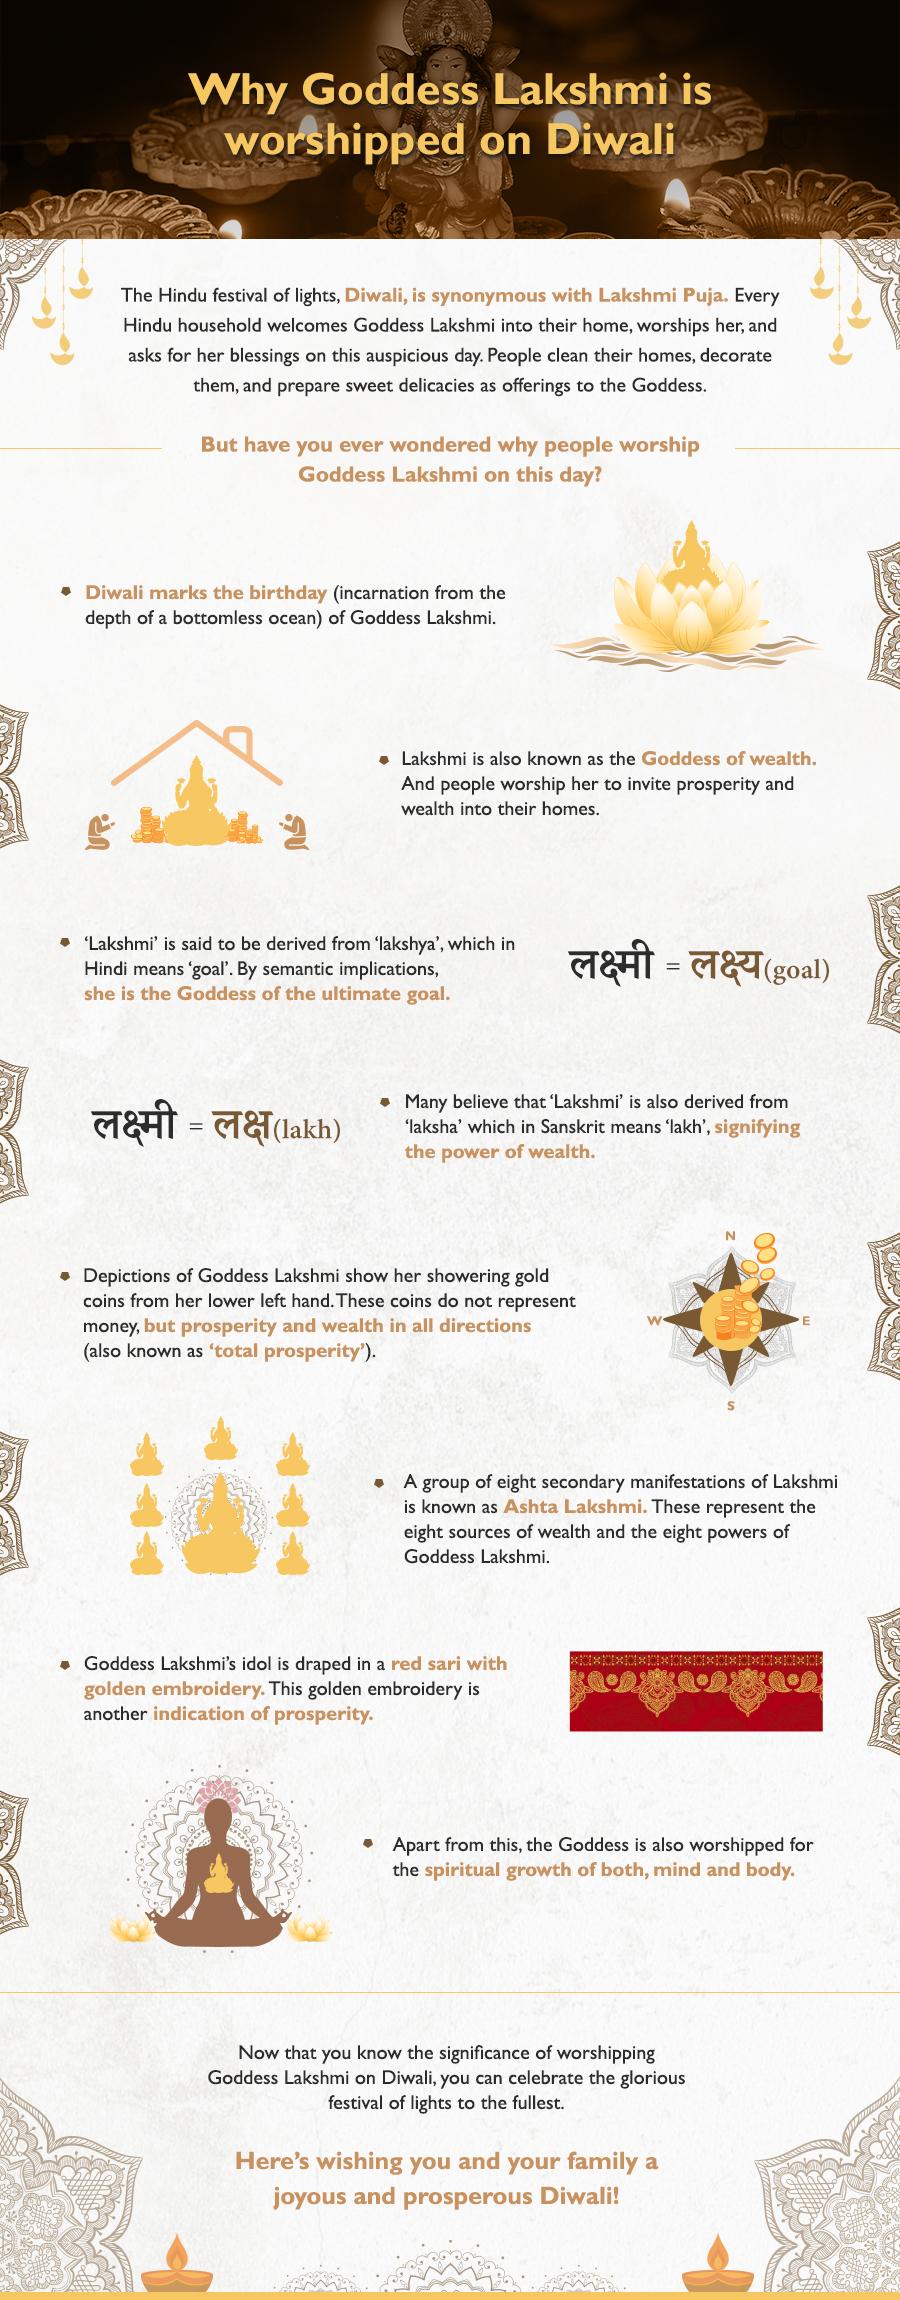 Know why people worship Goddess Lakshmi on Diwali.